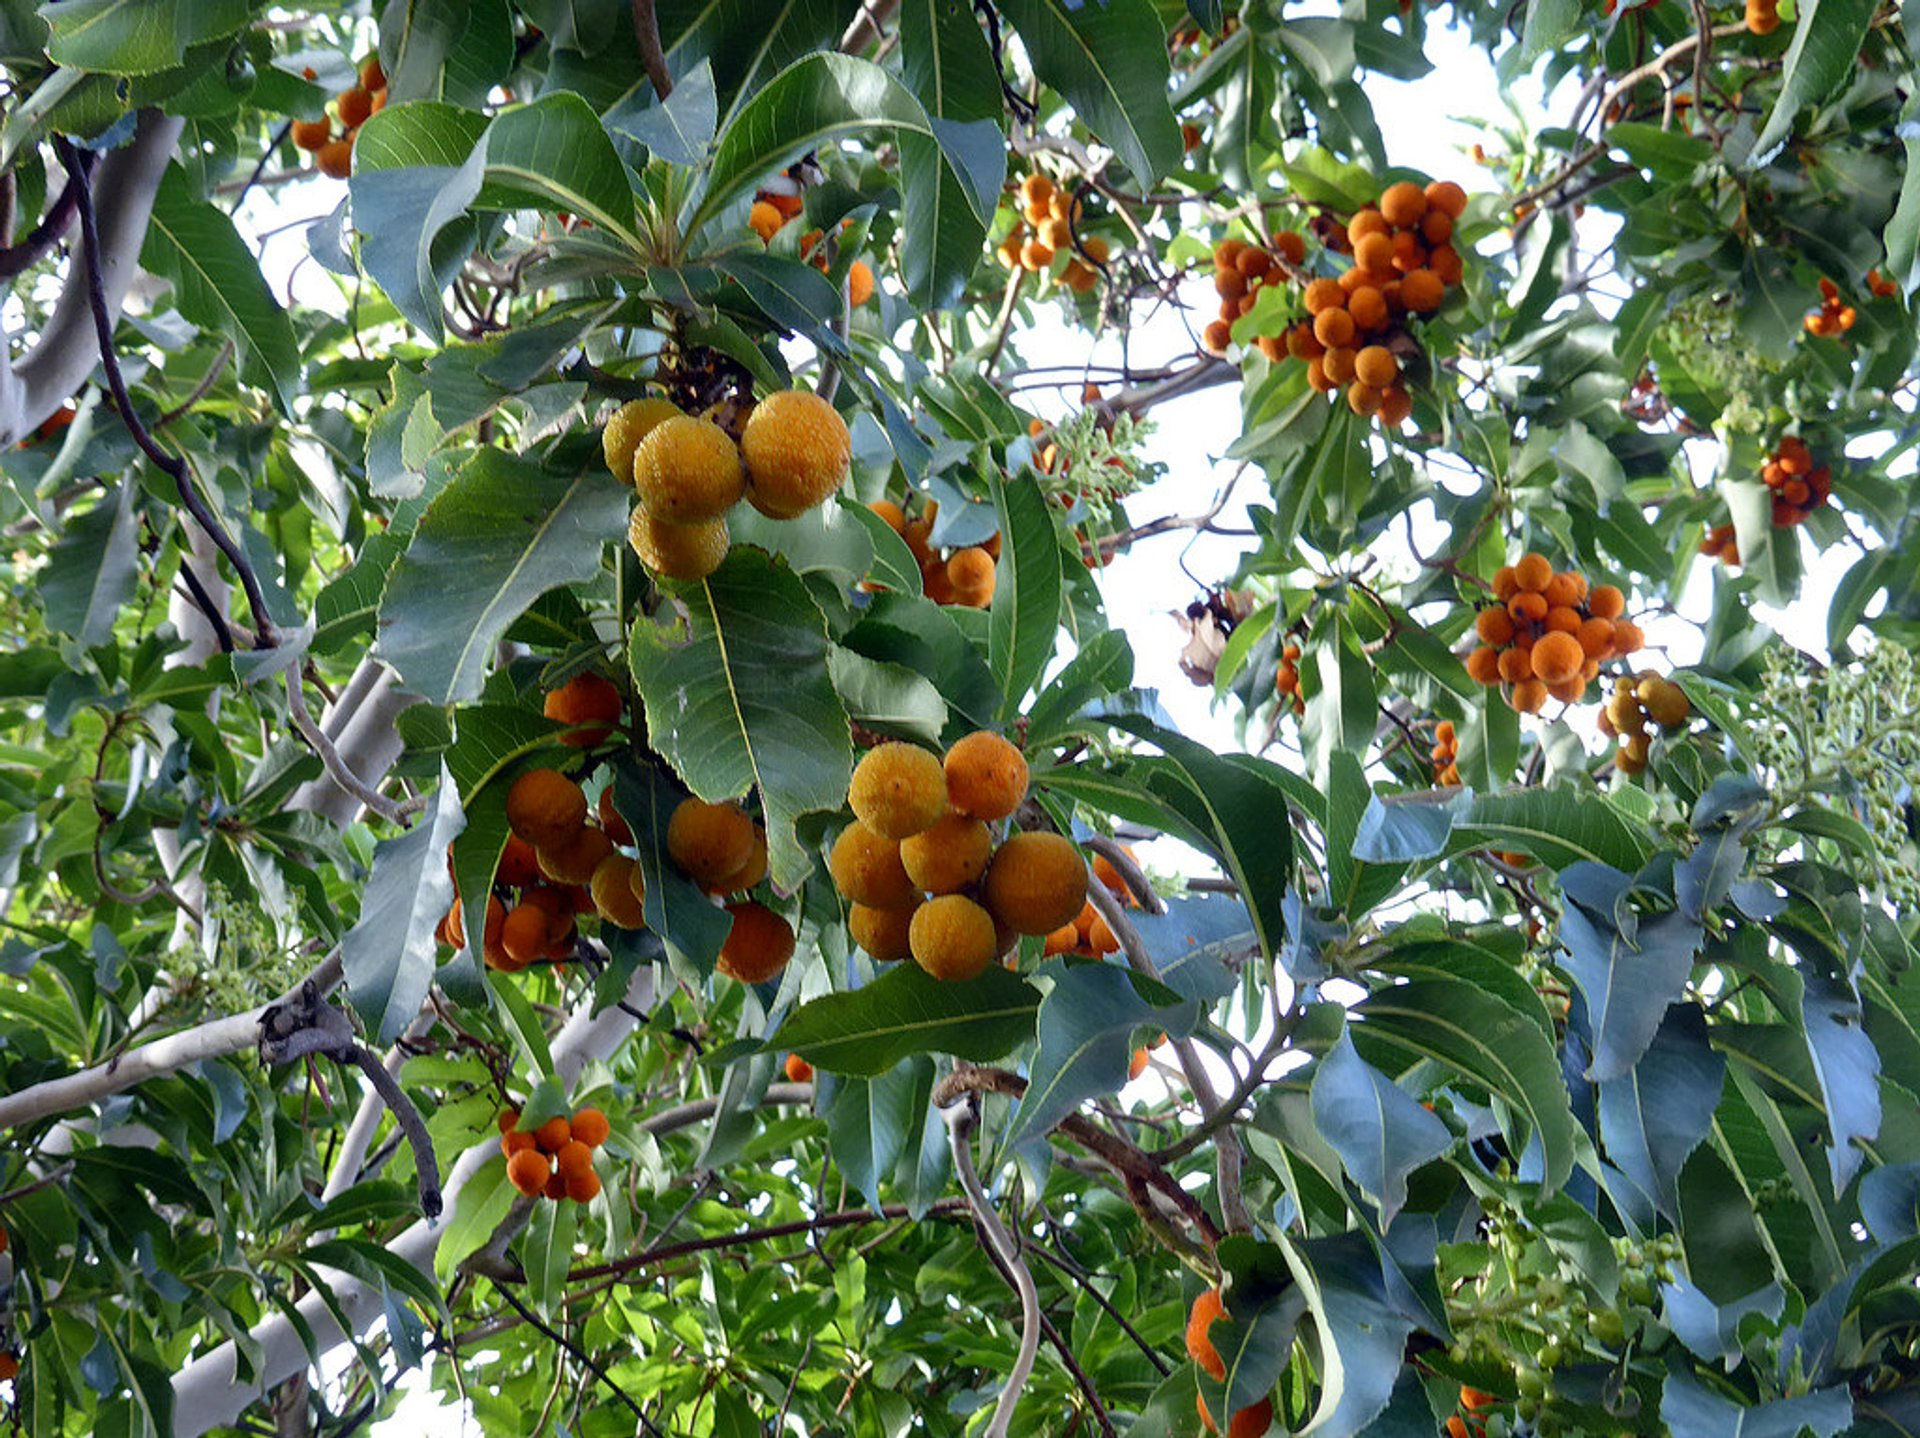 Orange Harvest in Canary Islands - Best Season 2019